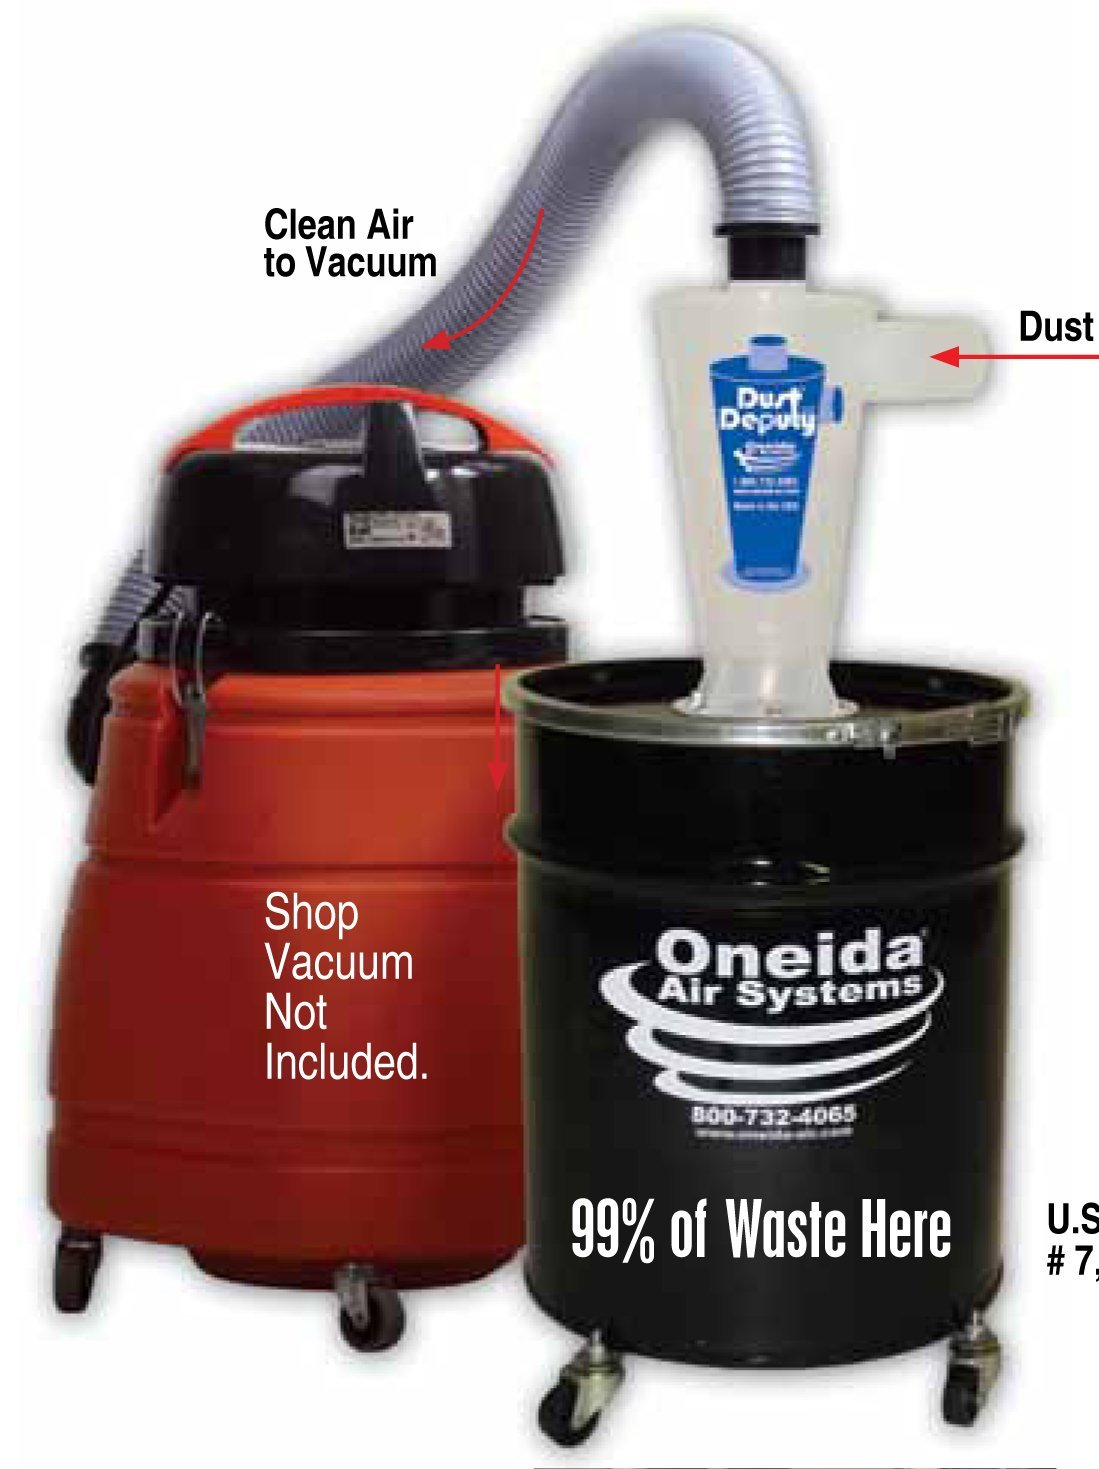 Oneida Molded Deluxe Dust Deputy Kit With 10 Gallon Steel